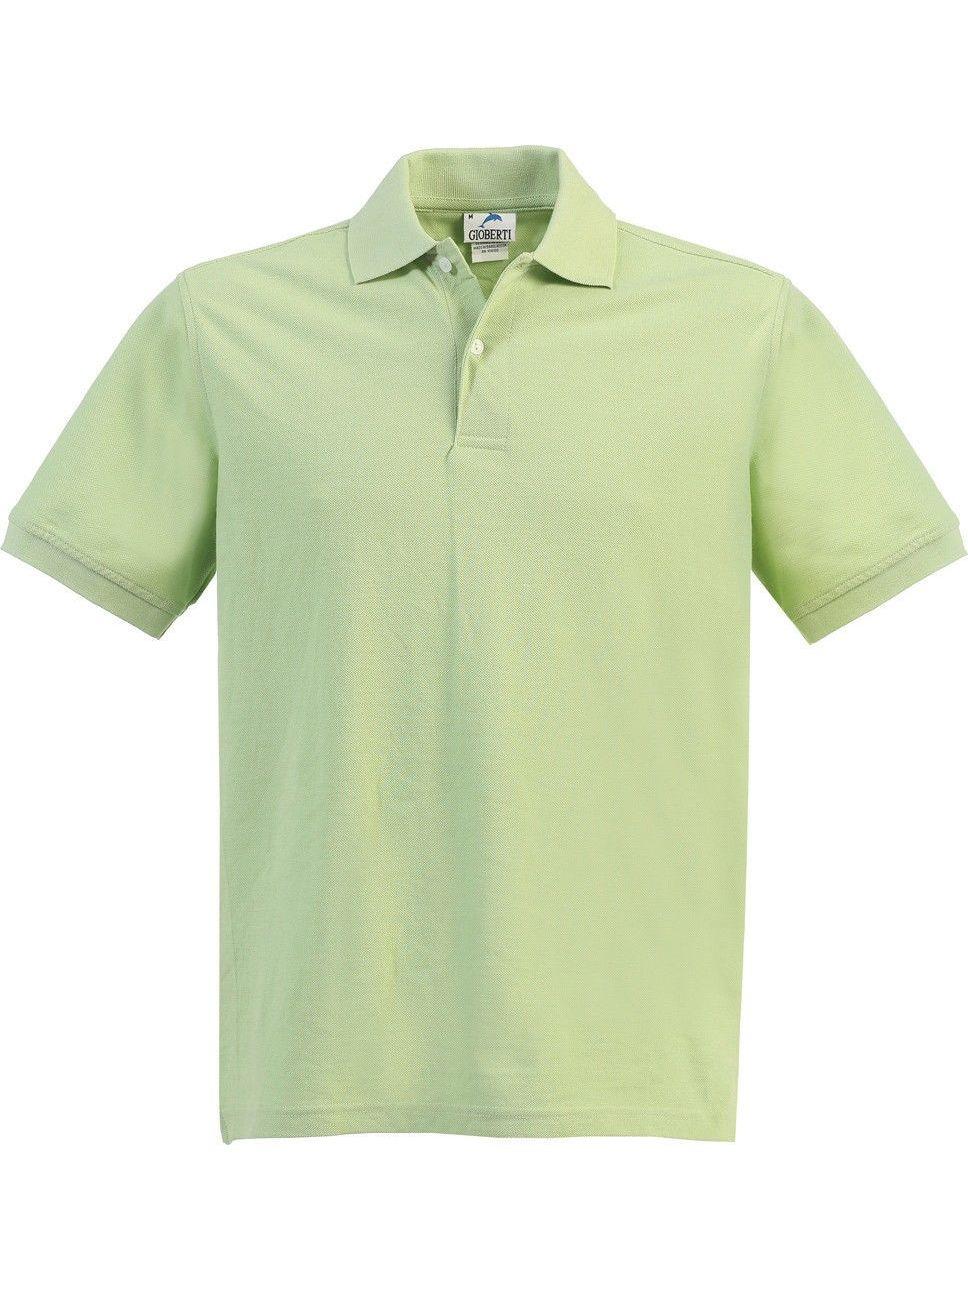 Boys Girls Paradise Green Short Sleeve School Uniform Polo Shirt 8-16